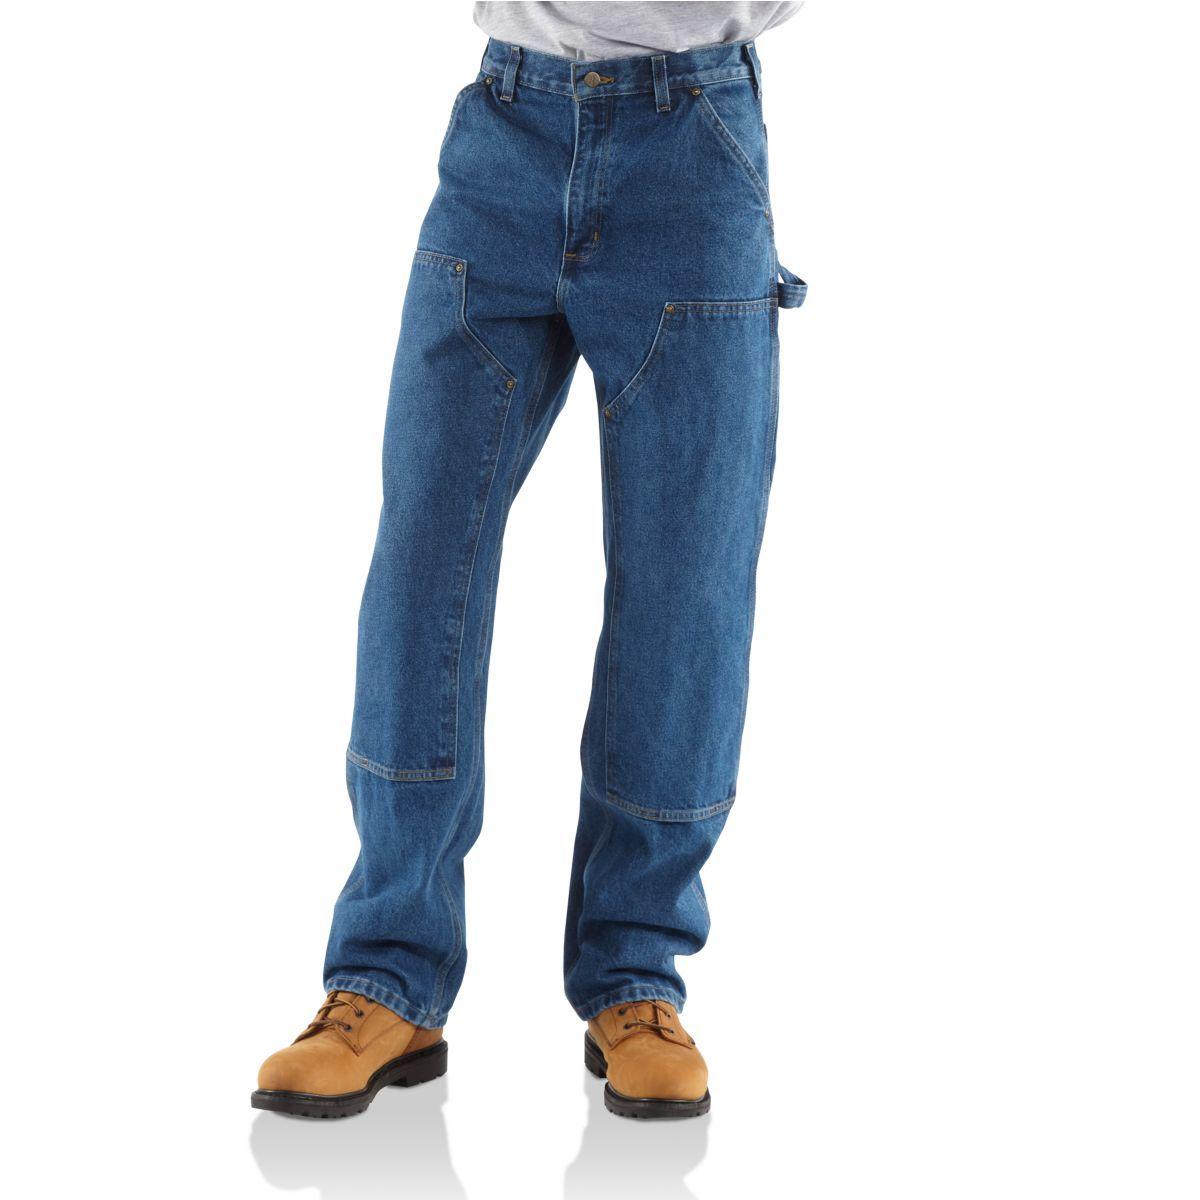 Carhartt Men's Double-Front Washed Logger Denim - Blue, 34/32